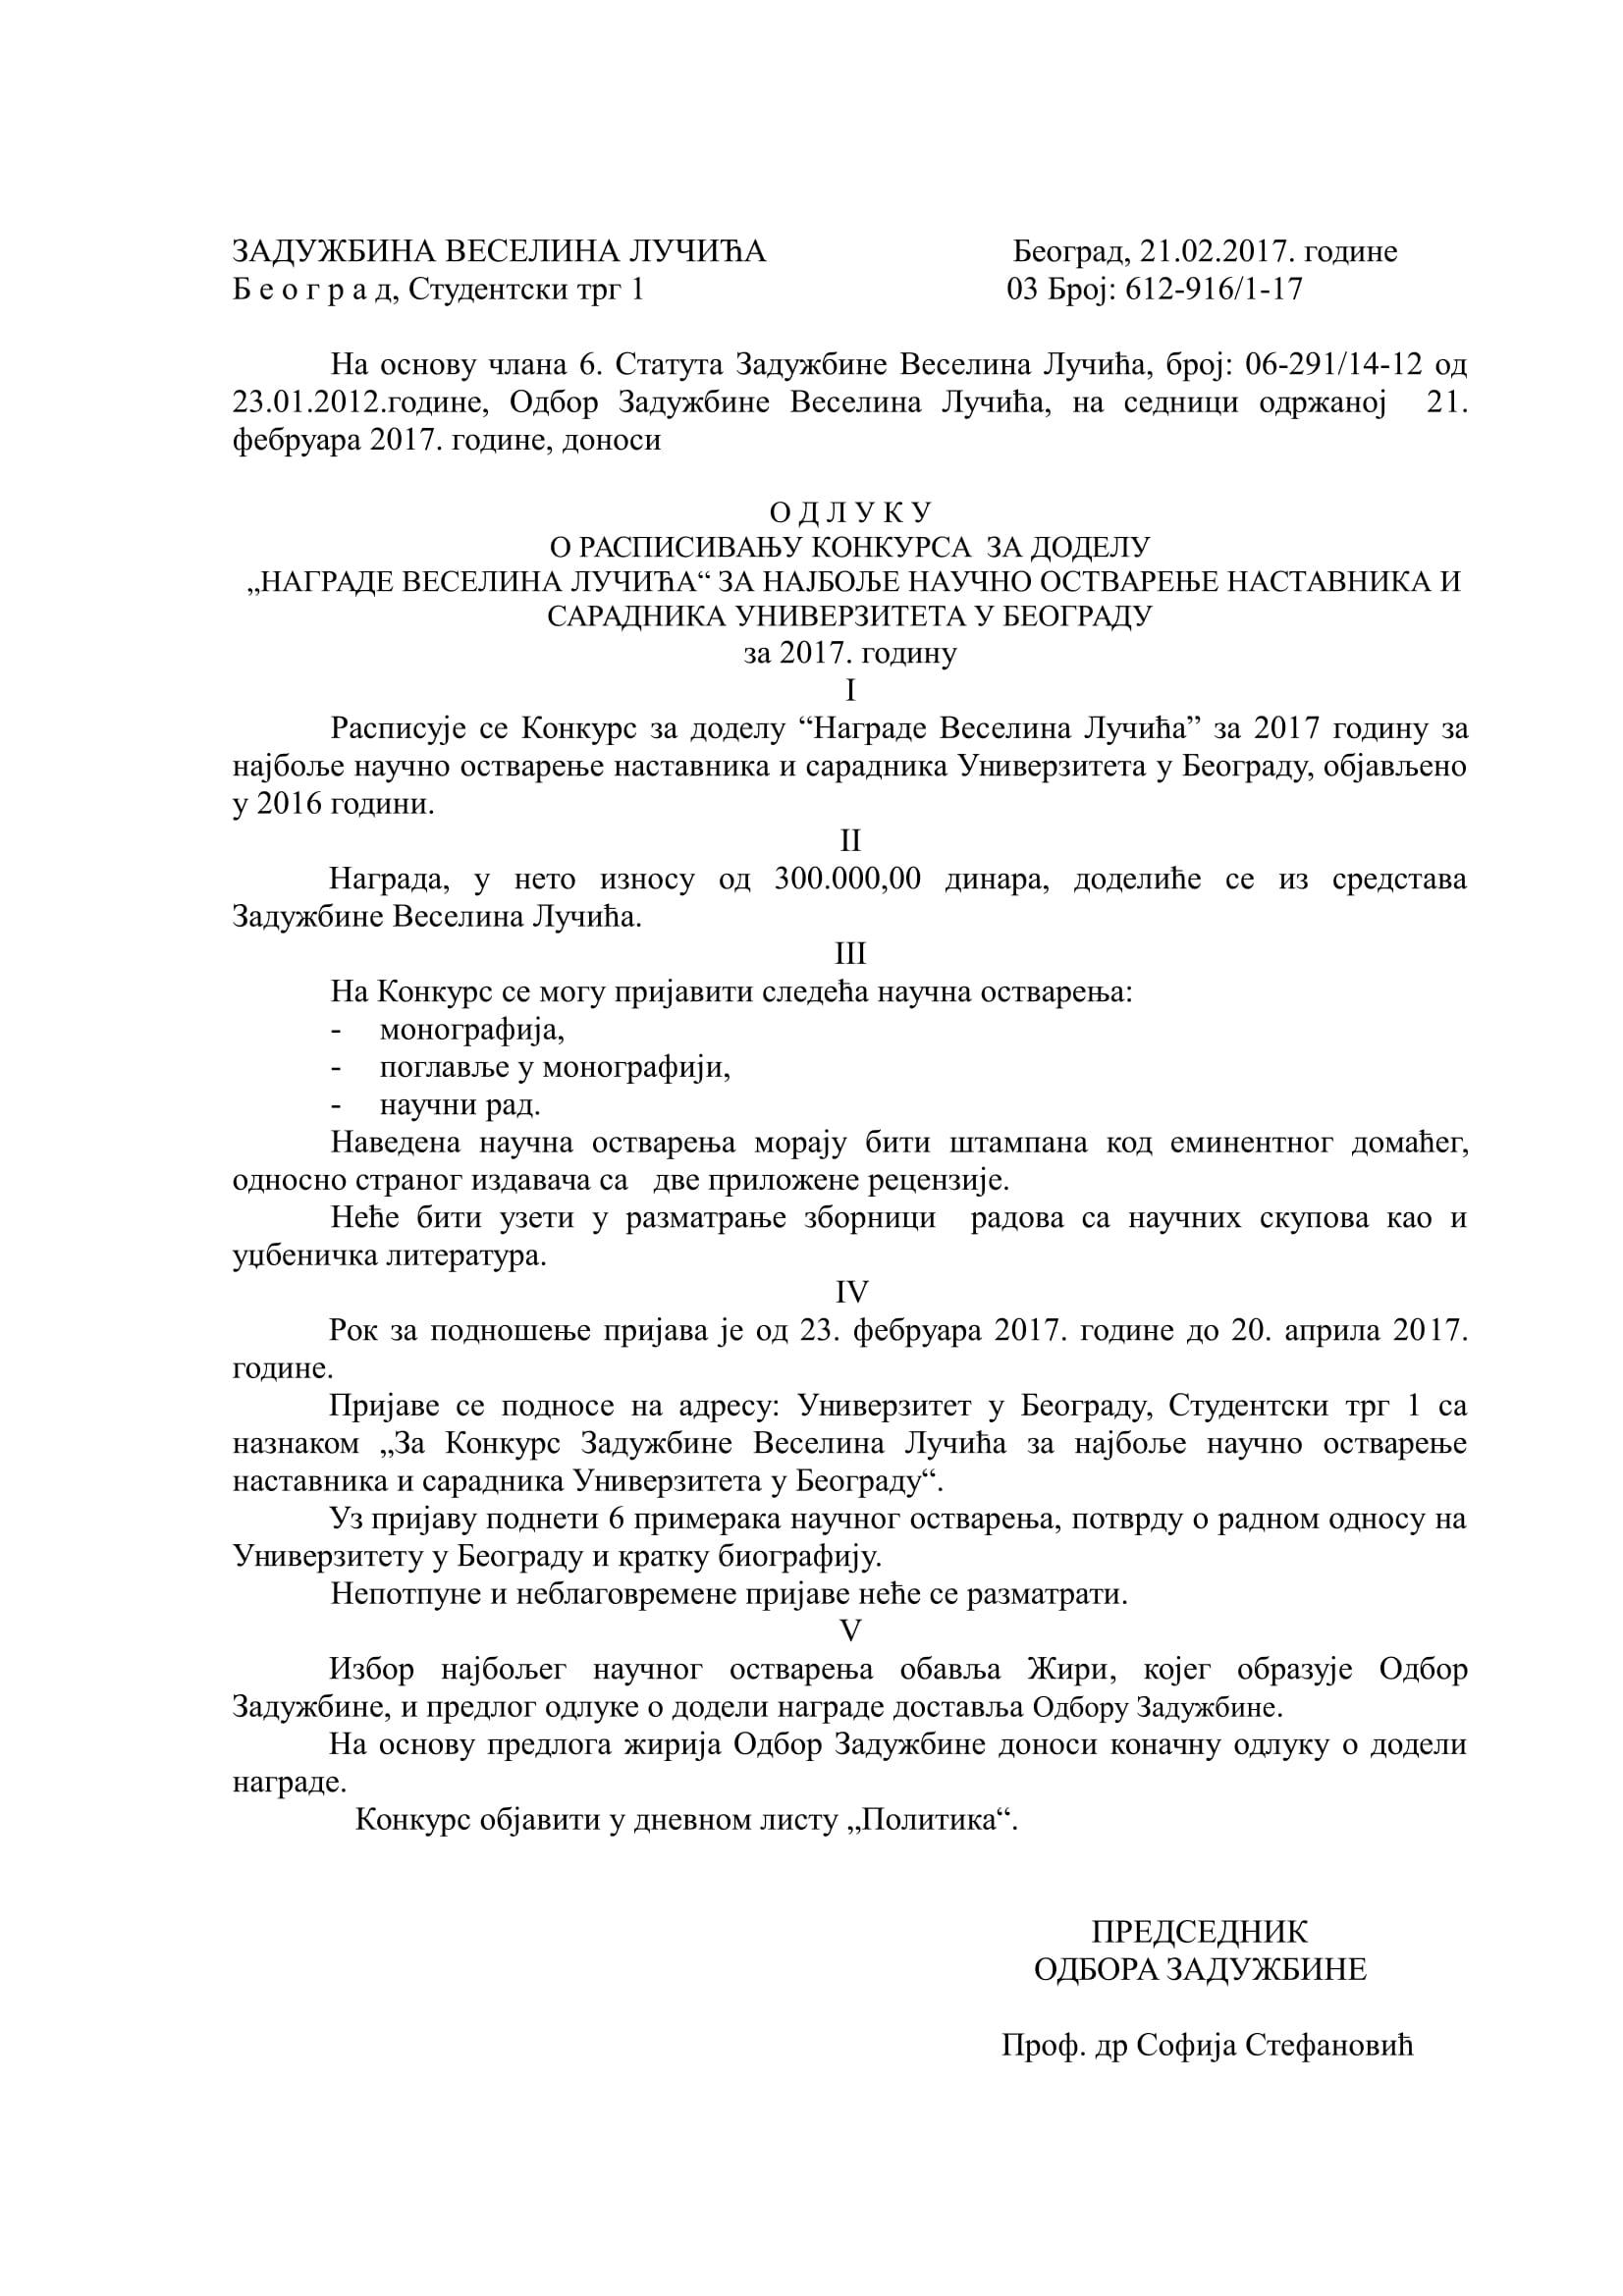 KONKURS ZA NAUCNO DELO (1)-1